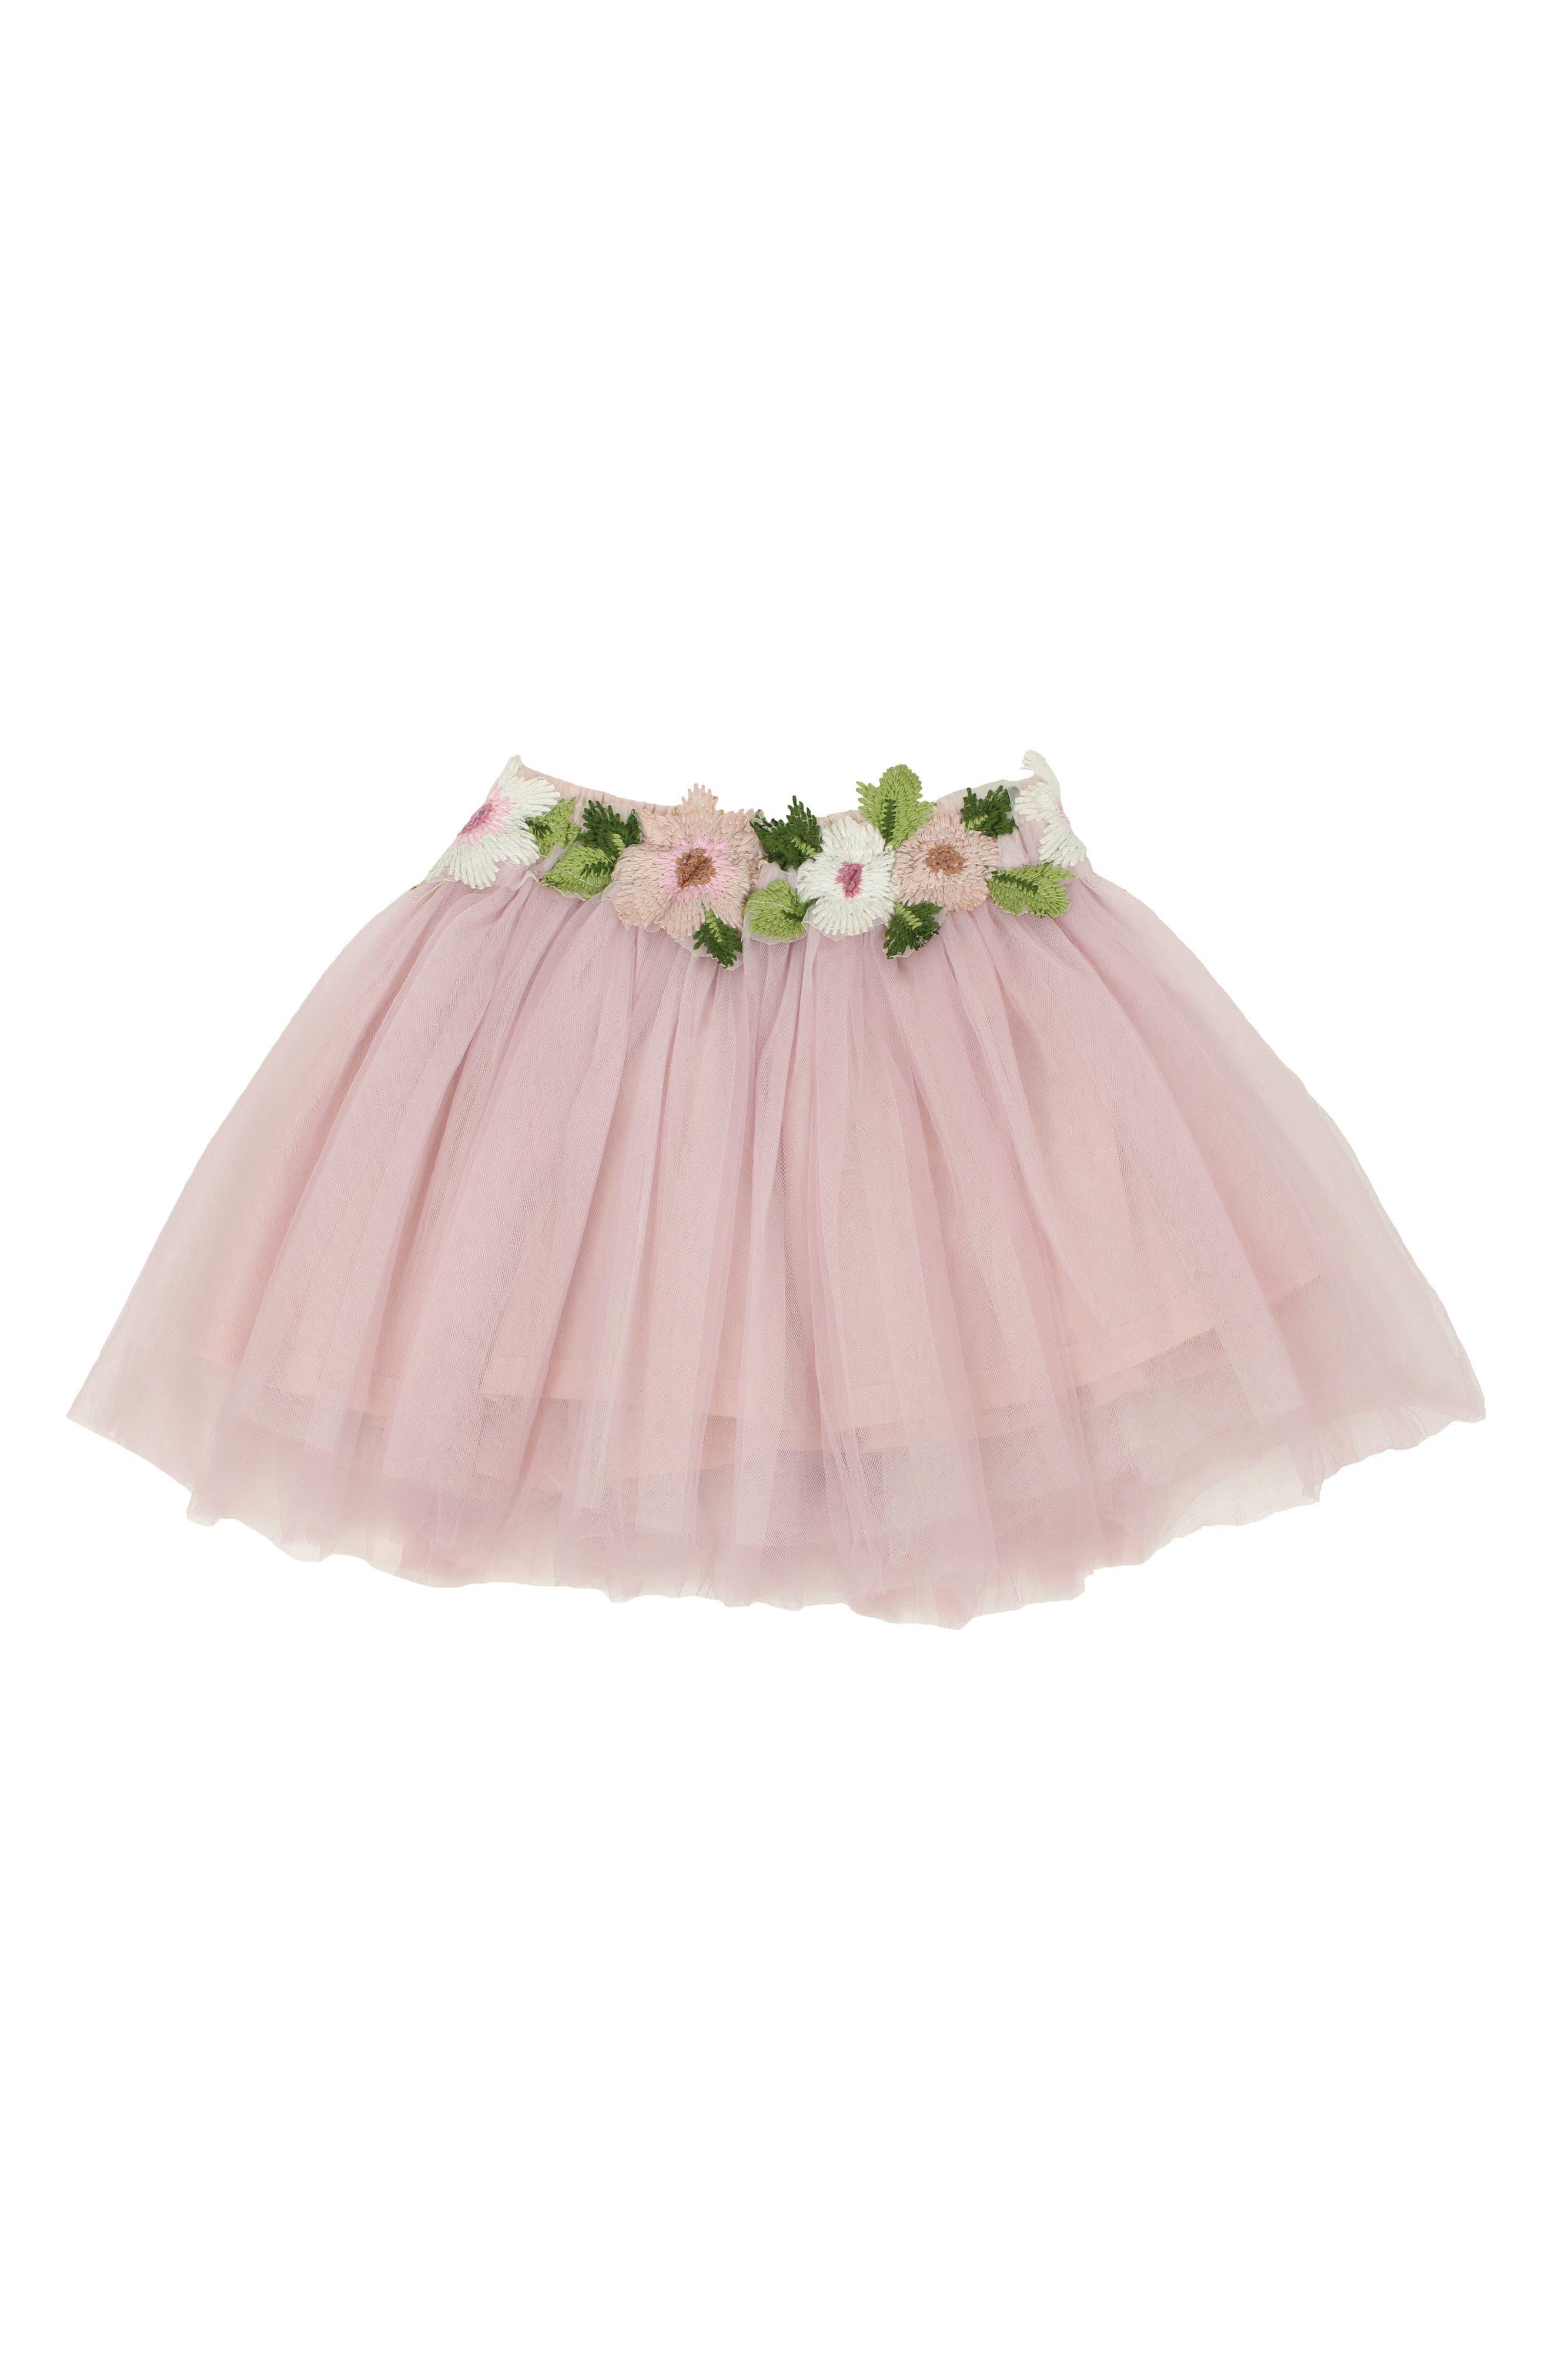 Main Image - Popatu Floral Embellished Tulle Skirt (Toddler Girls & Little Girls)